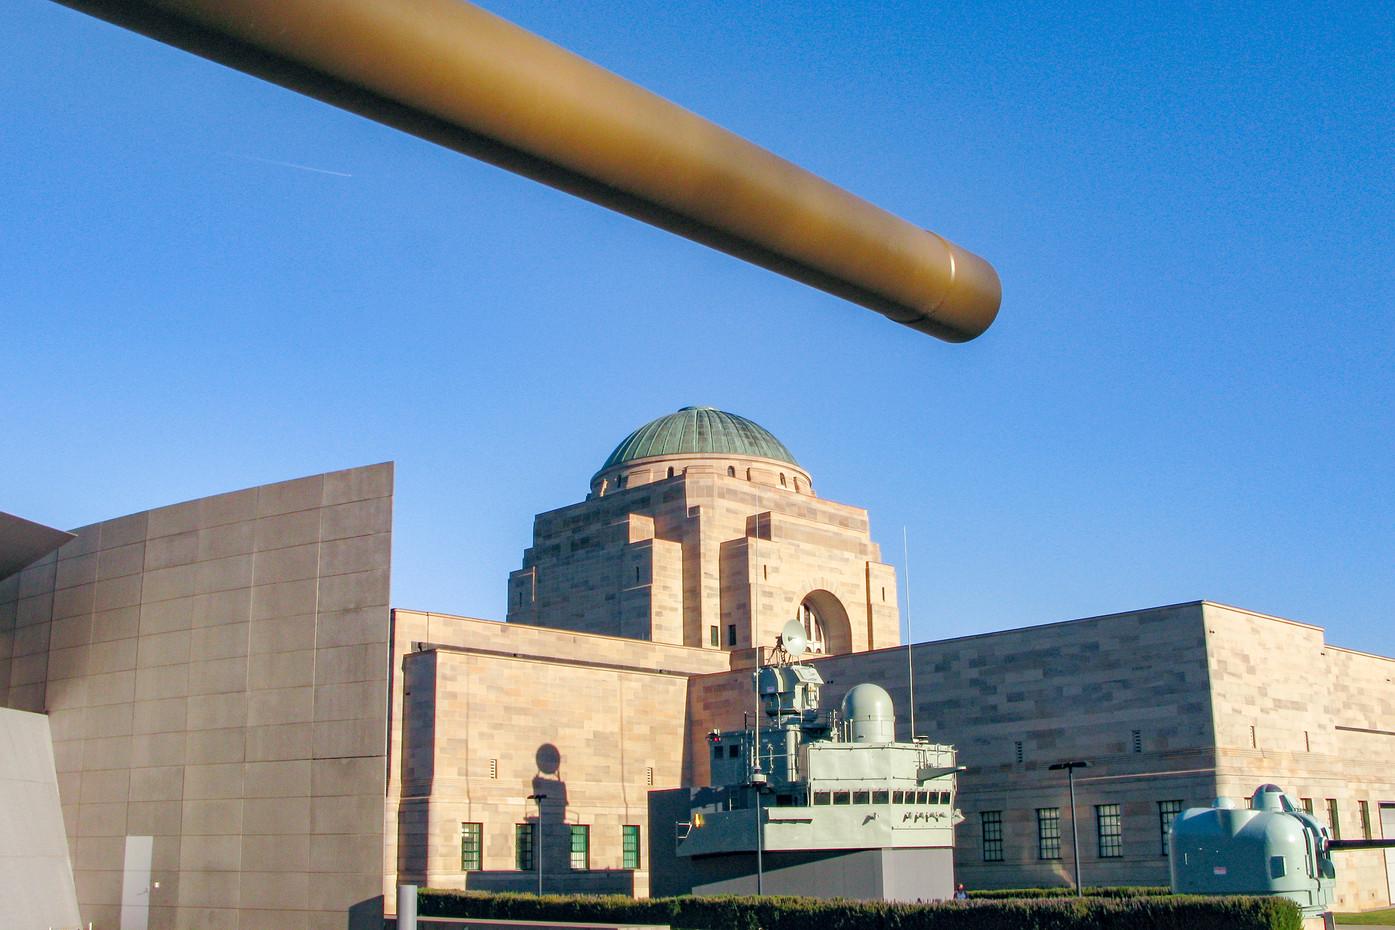 Australian War Memorial in Canberra, Australia